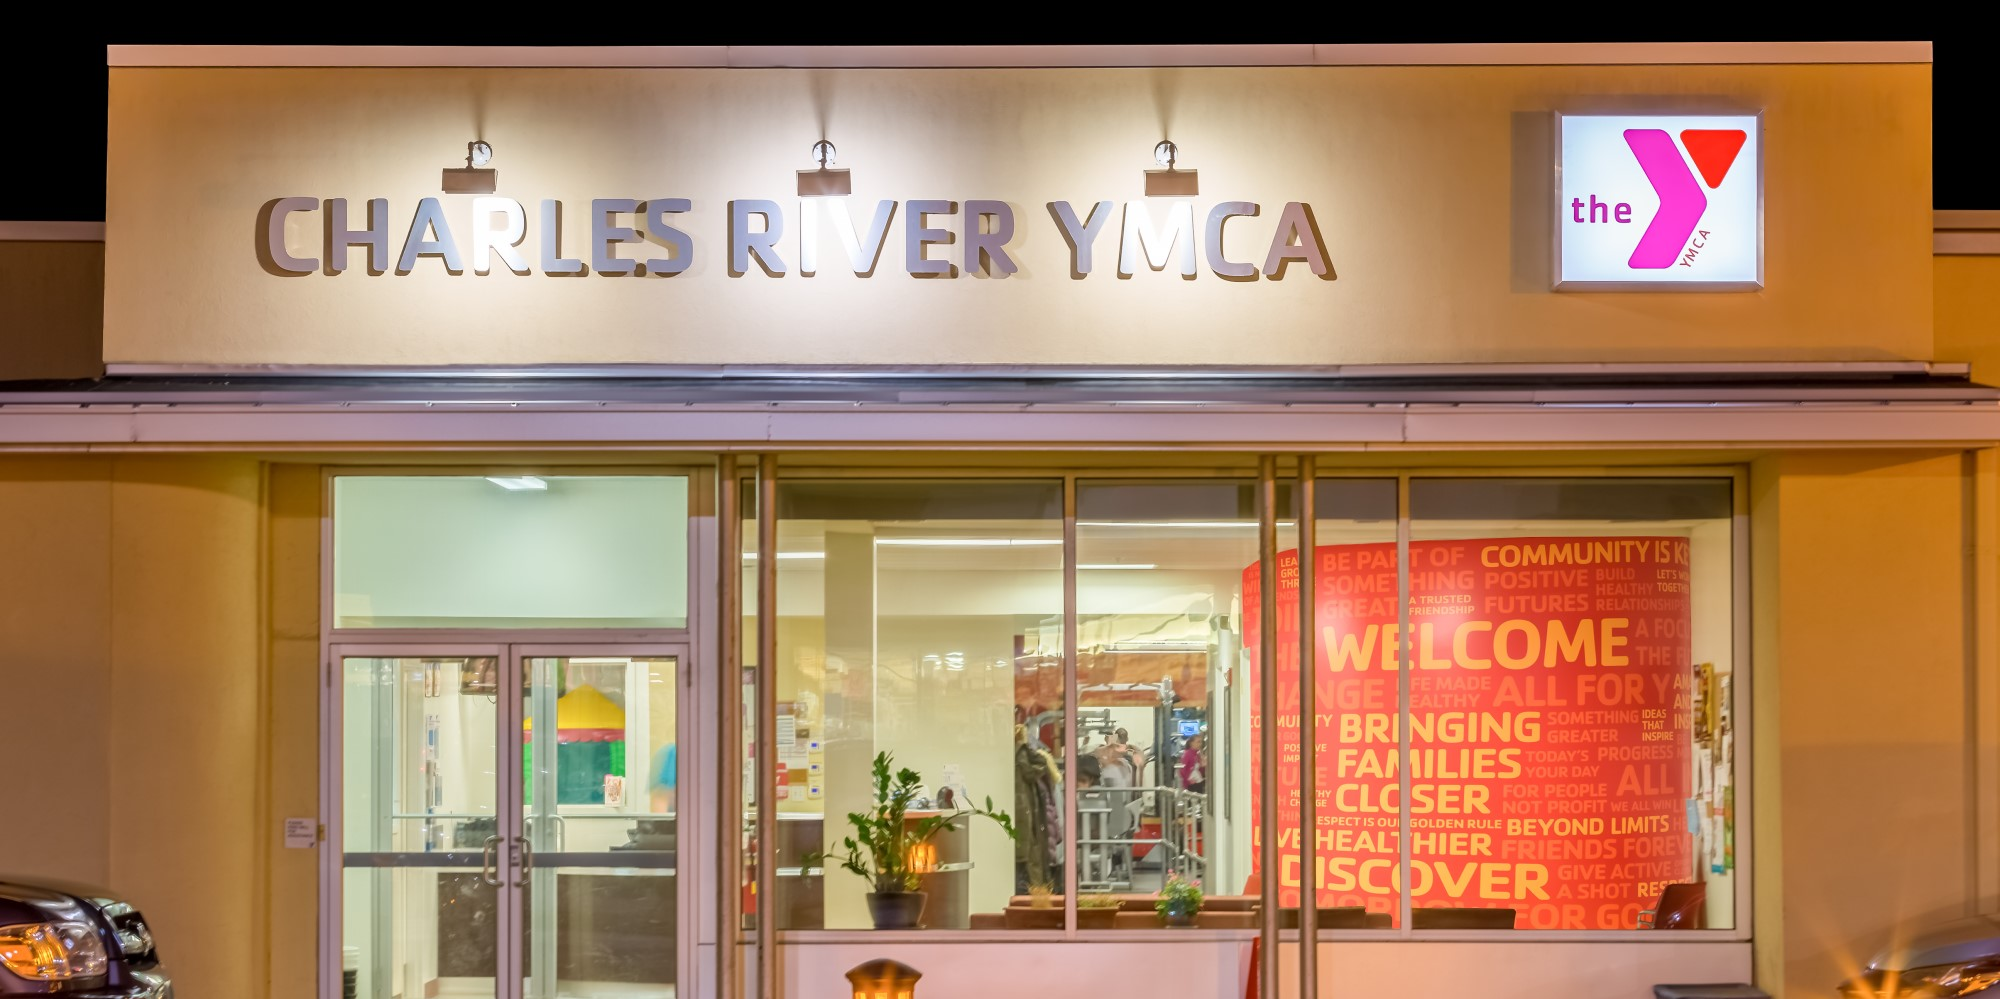 Charles River YMCA